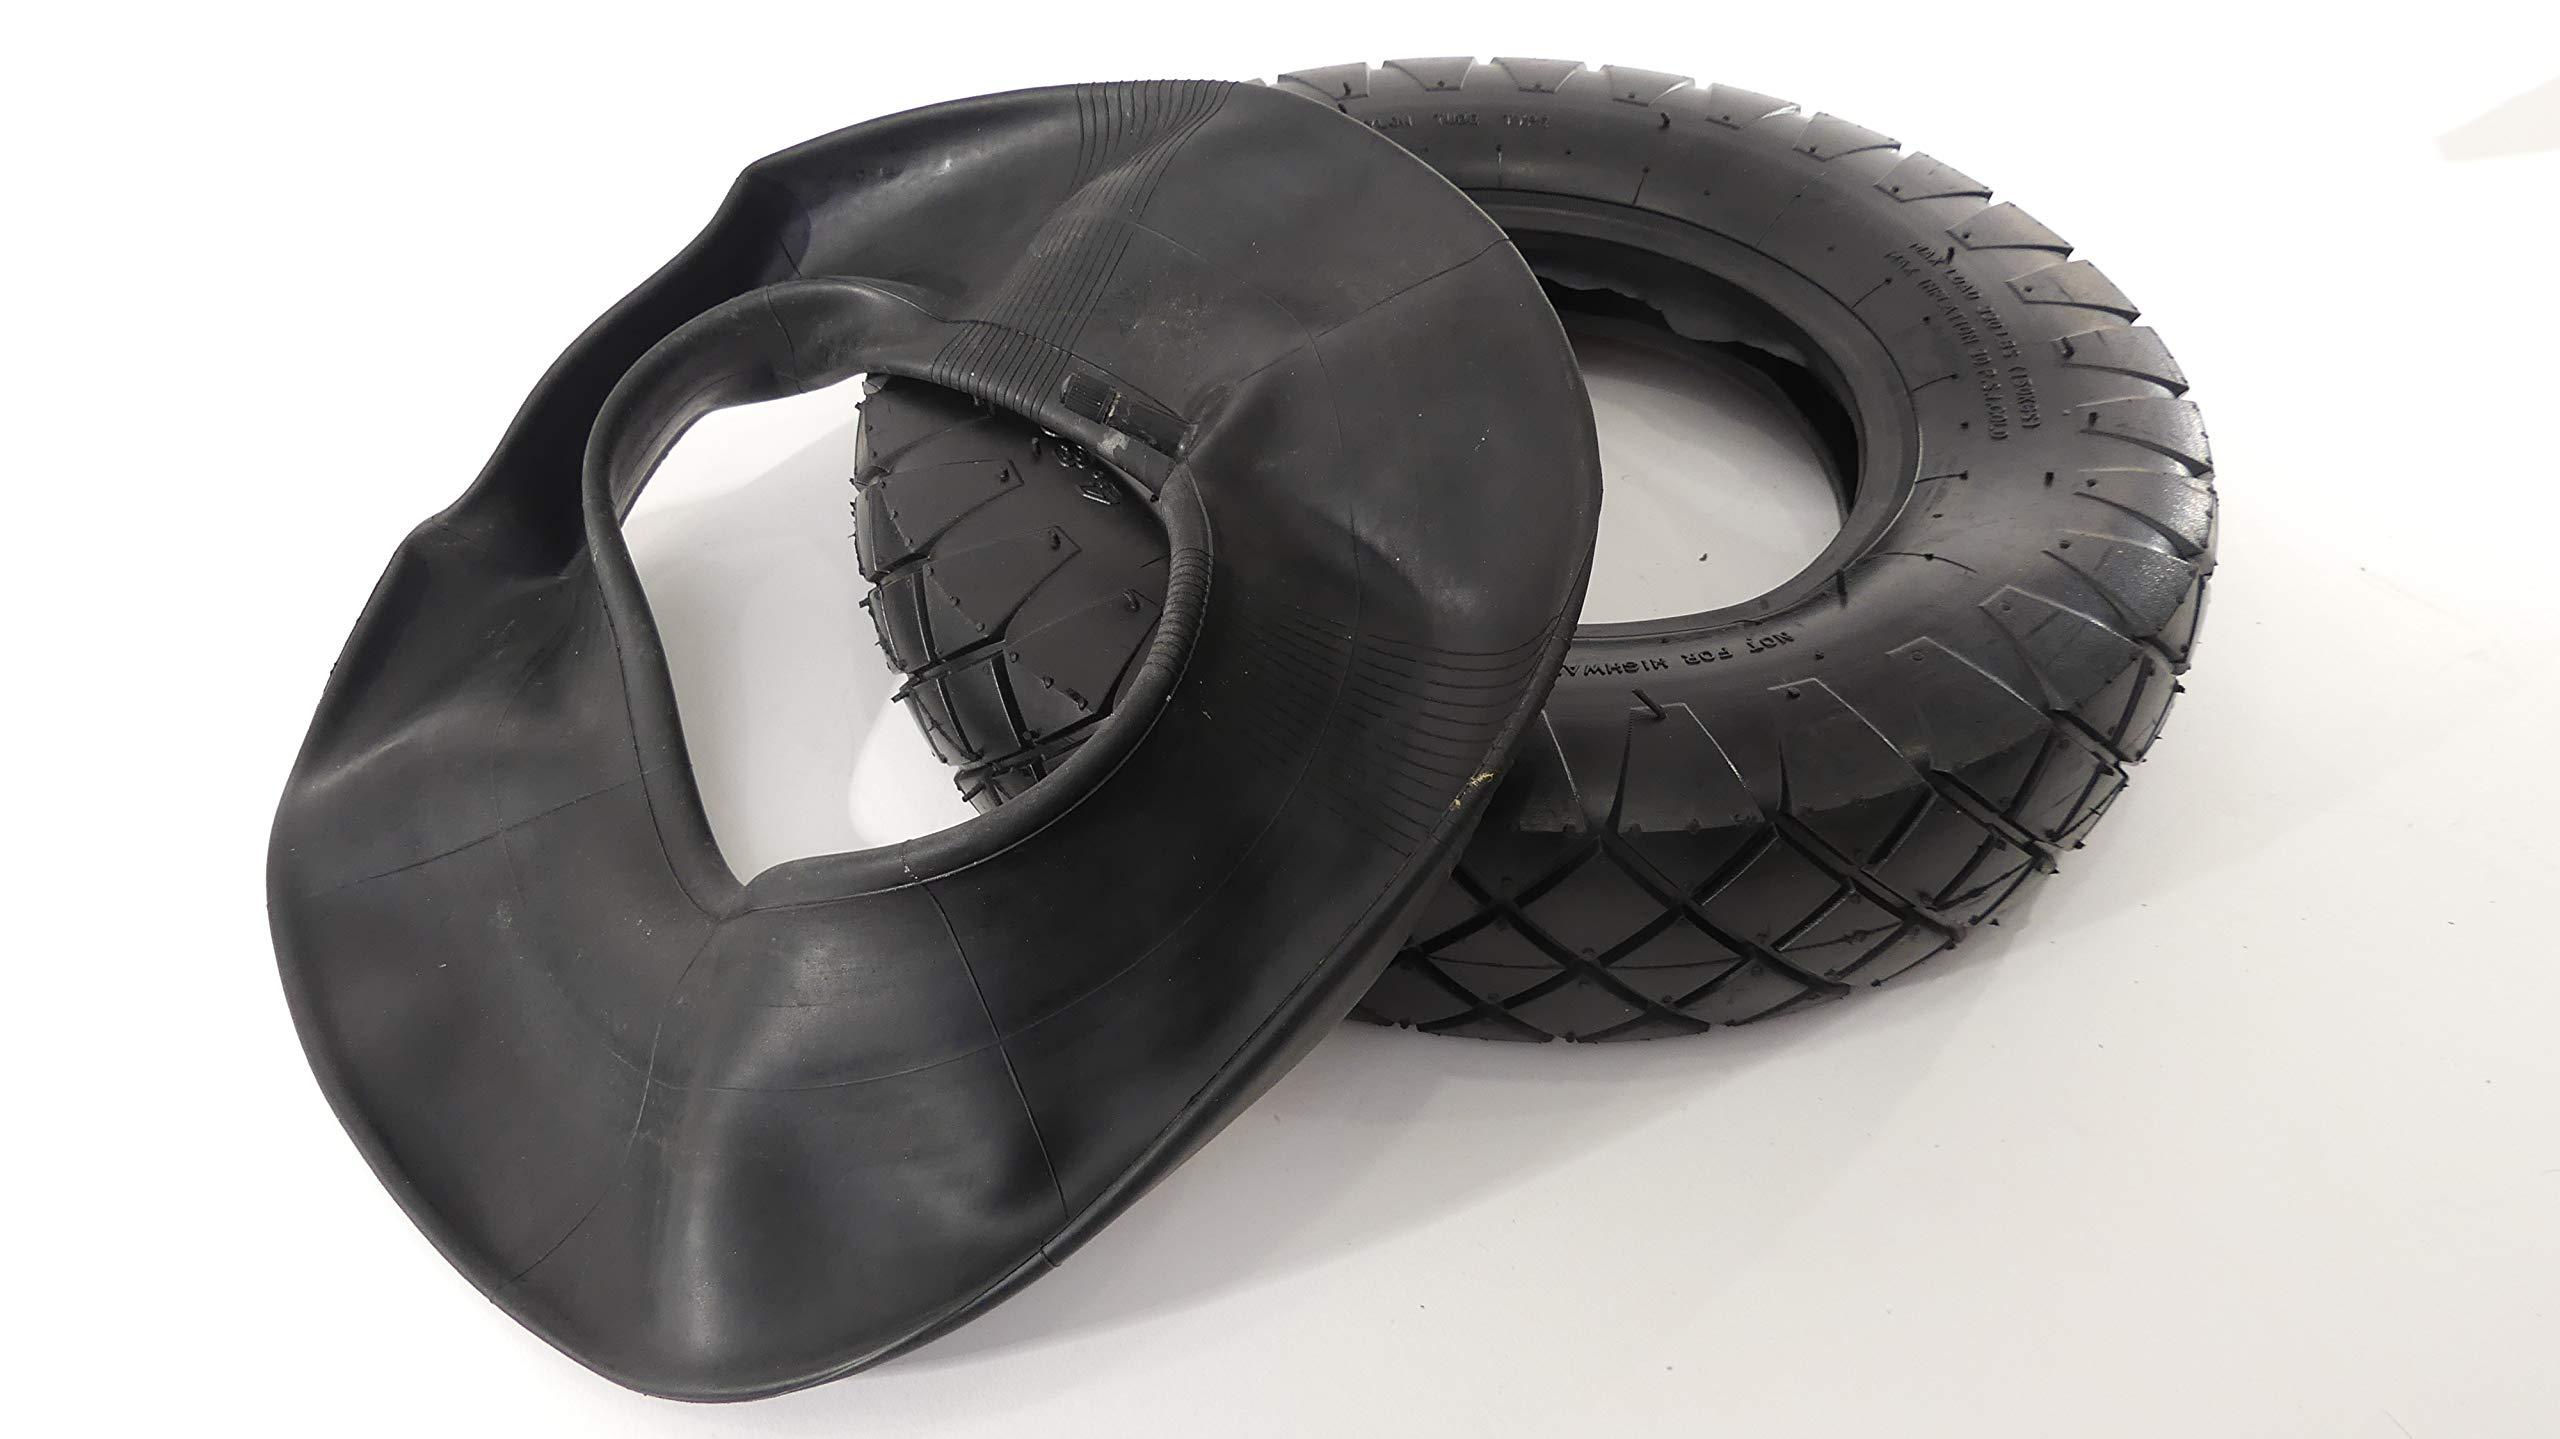 Tech Team Tire and Tube Set, 4.00-8 Rubber Tire, Rubber Inner Tube, Schrader Style Tire Valve, Wheelbarrow, Garden Cart, Hand Truck by Tech Team